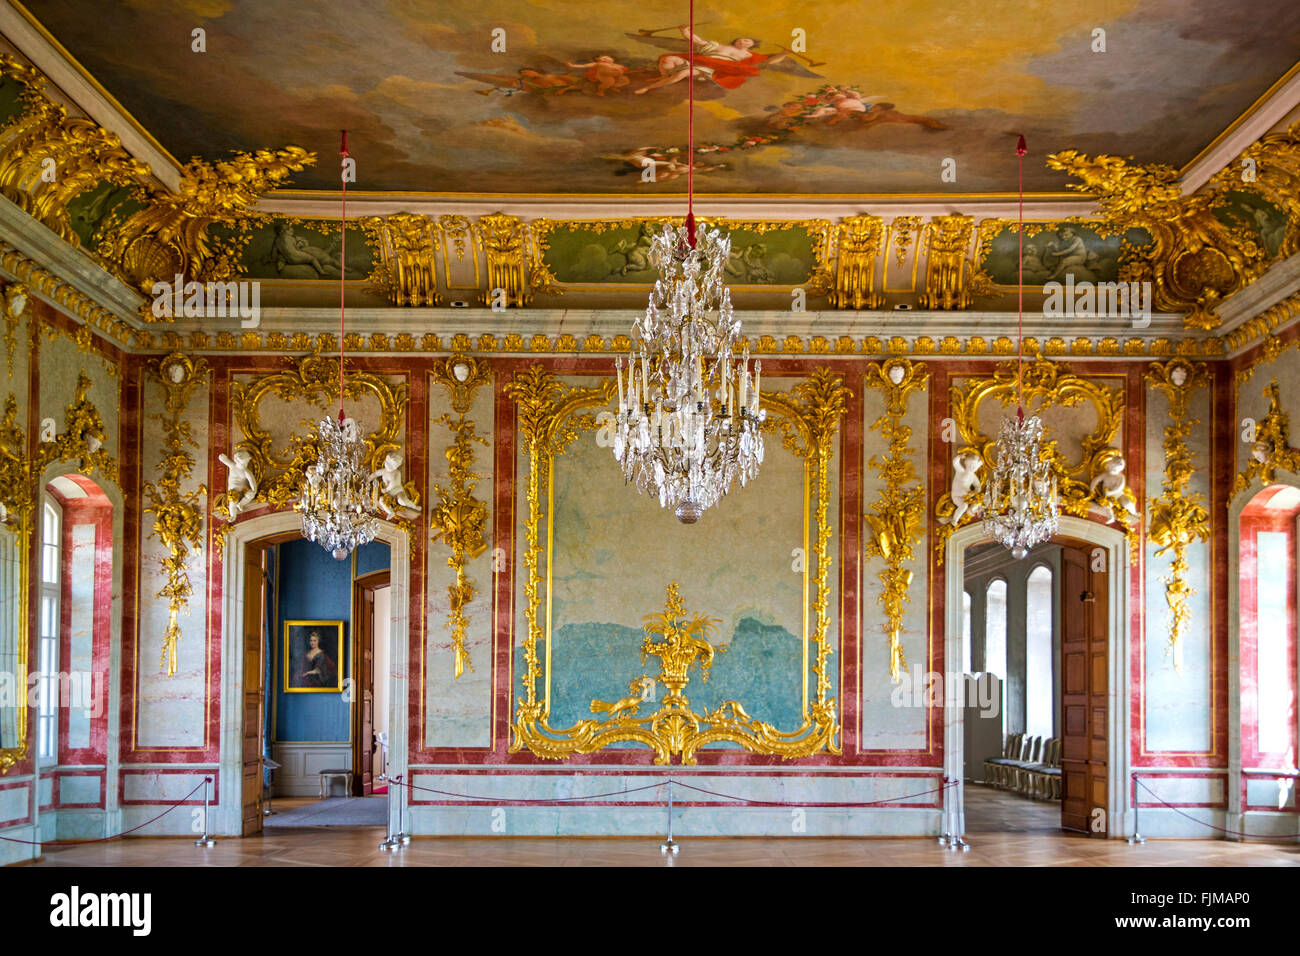 Kronleuchter Barock Gold ~ Geographie reisen lettland bauska schloss rundale barock